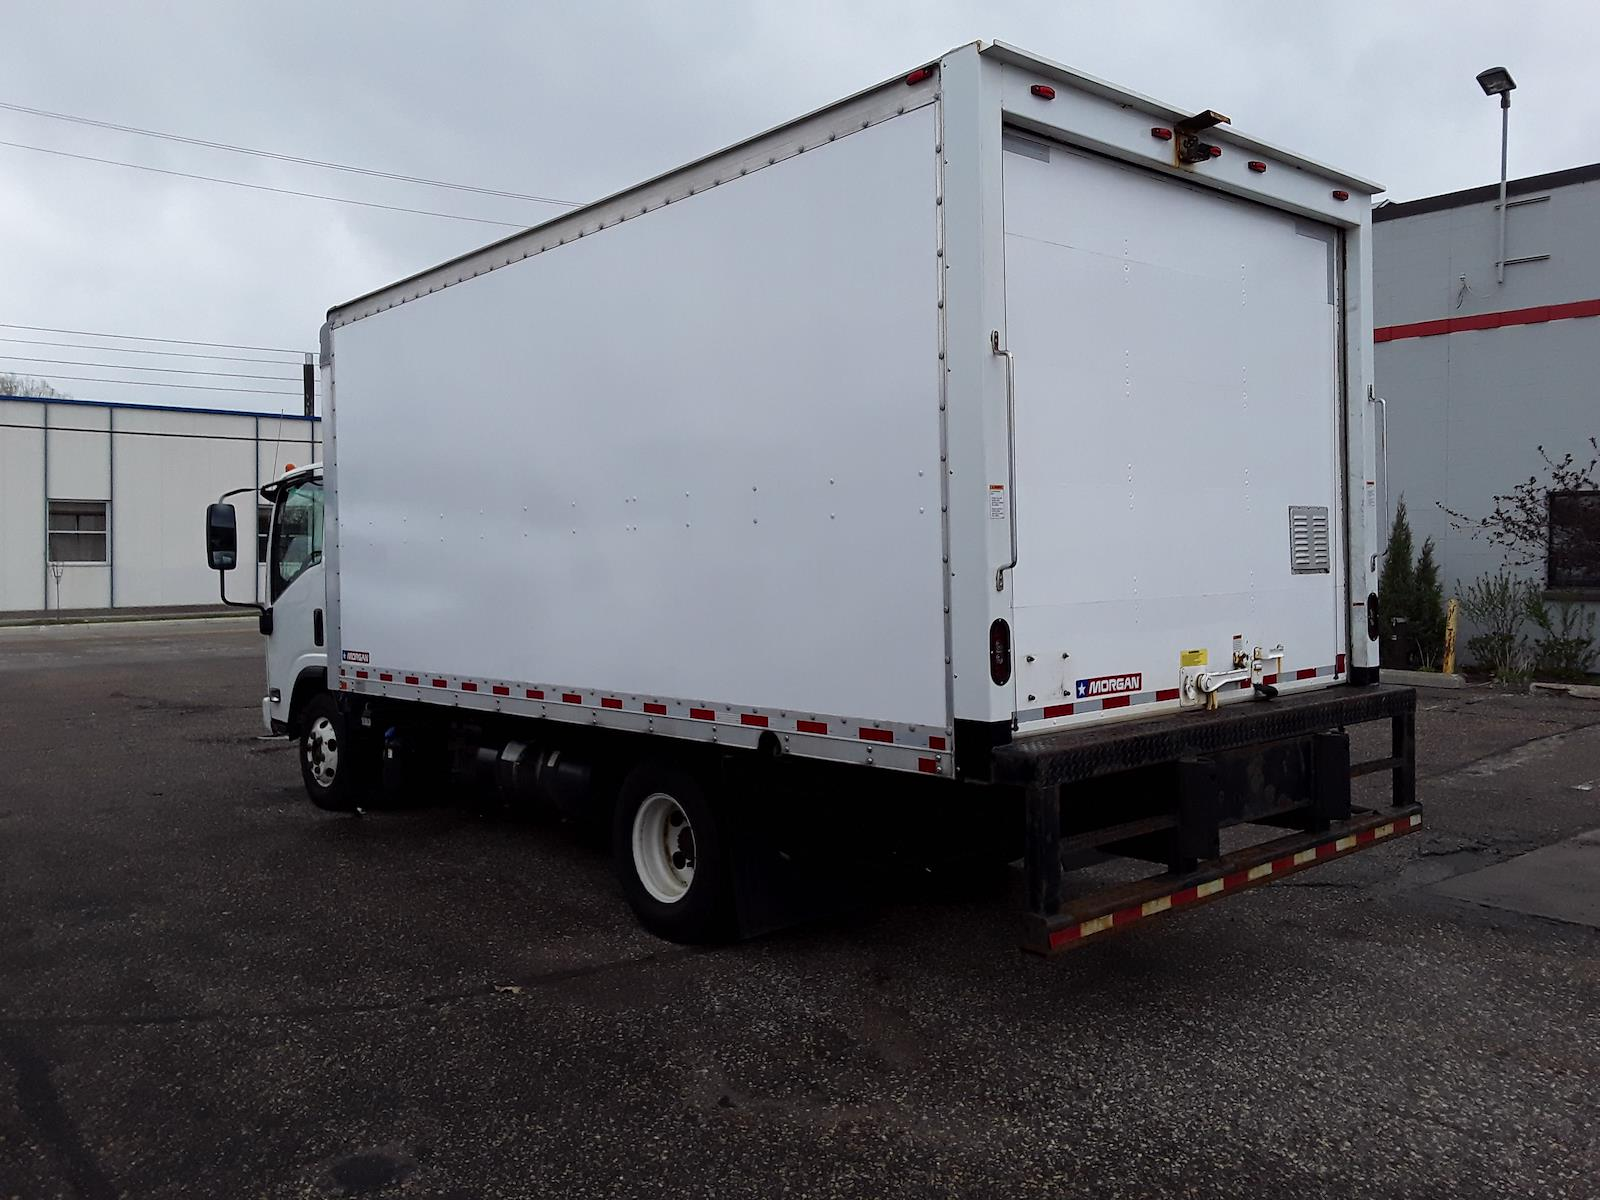 2016 Isuzu NPR Regular Cab 4x2, Dry Freight #744164 - photo 1